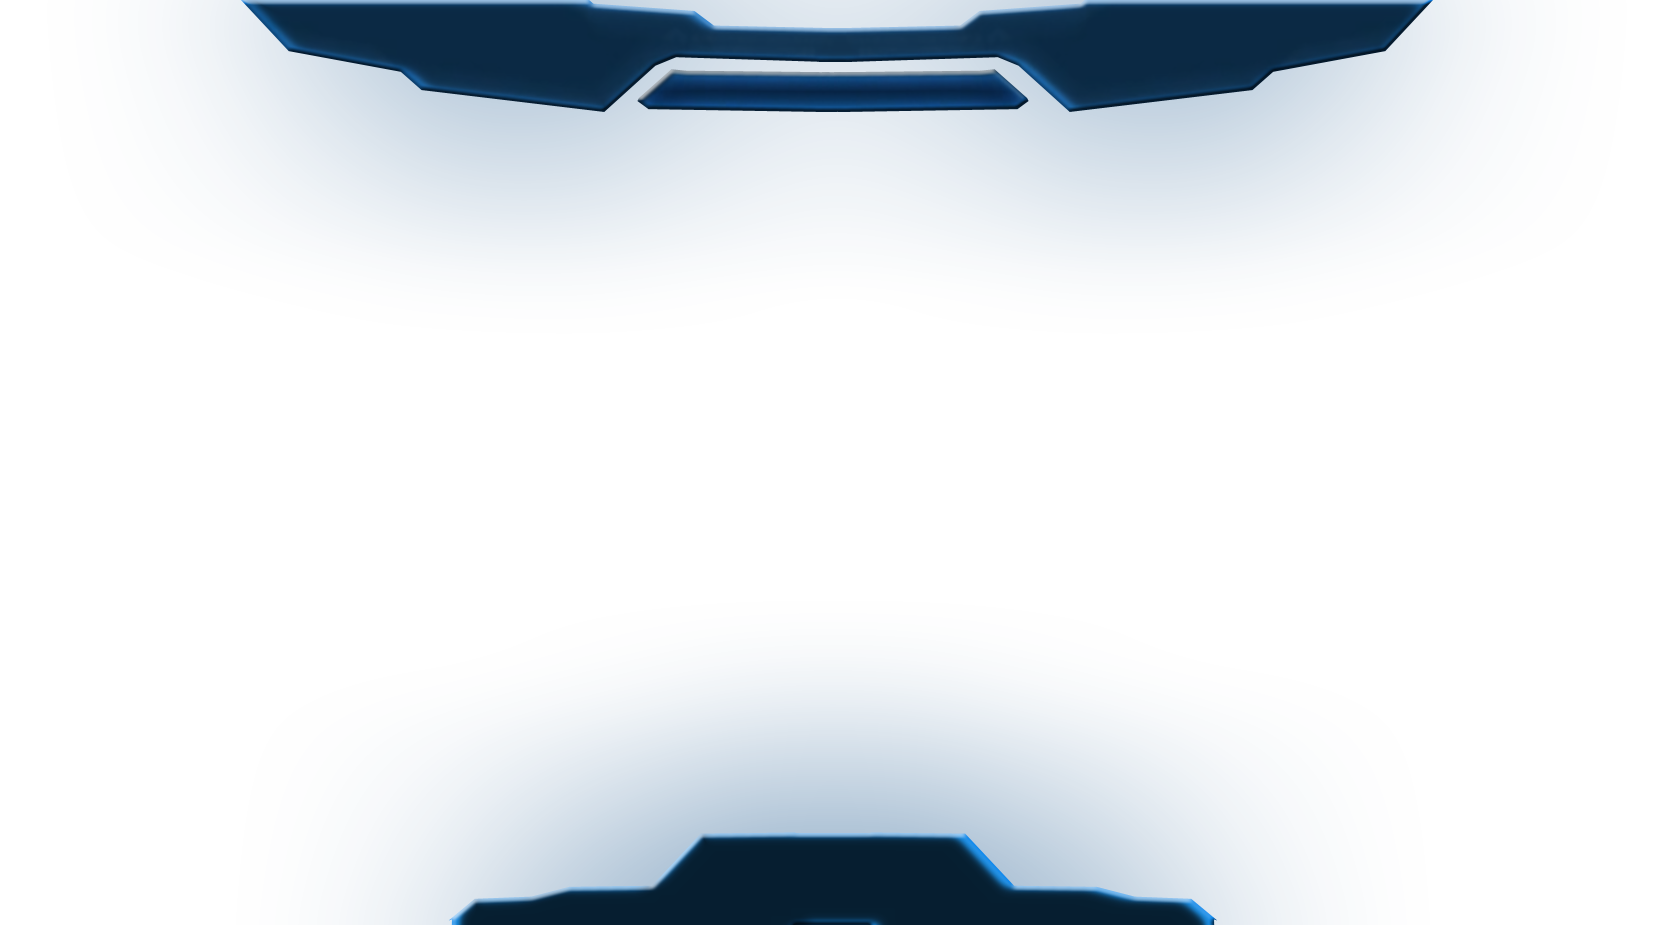 futuristic machine graphic overlay - HD1680×925